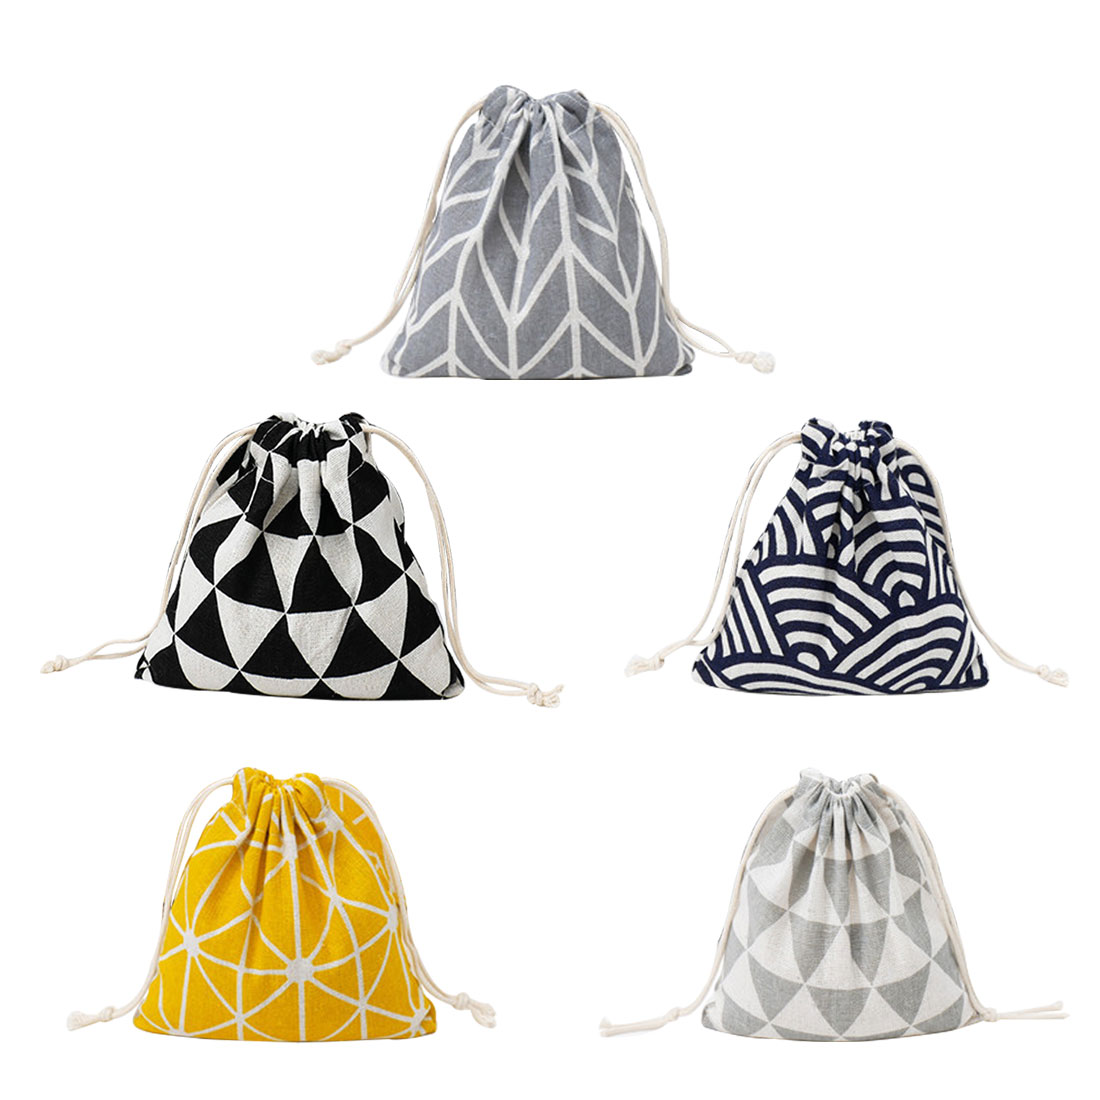 Women Cotton Drawstring Cosmetic Bag Travel Luggage Makeup Bags Toiletry Make Up Wash Storage Kit Organizer Bags Cases